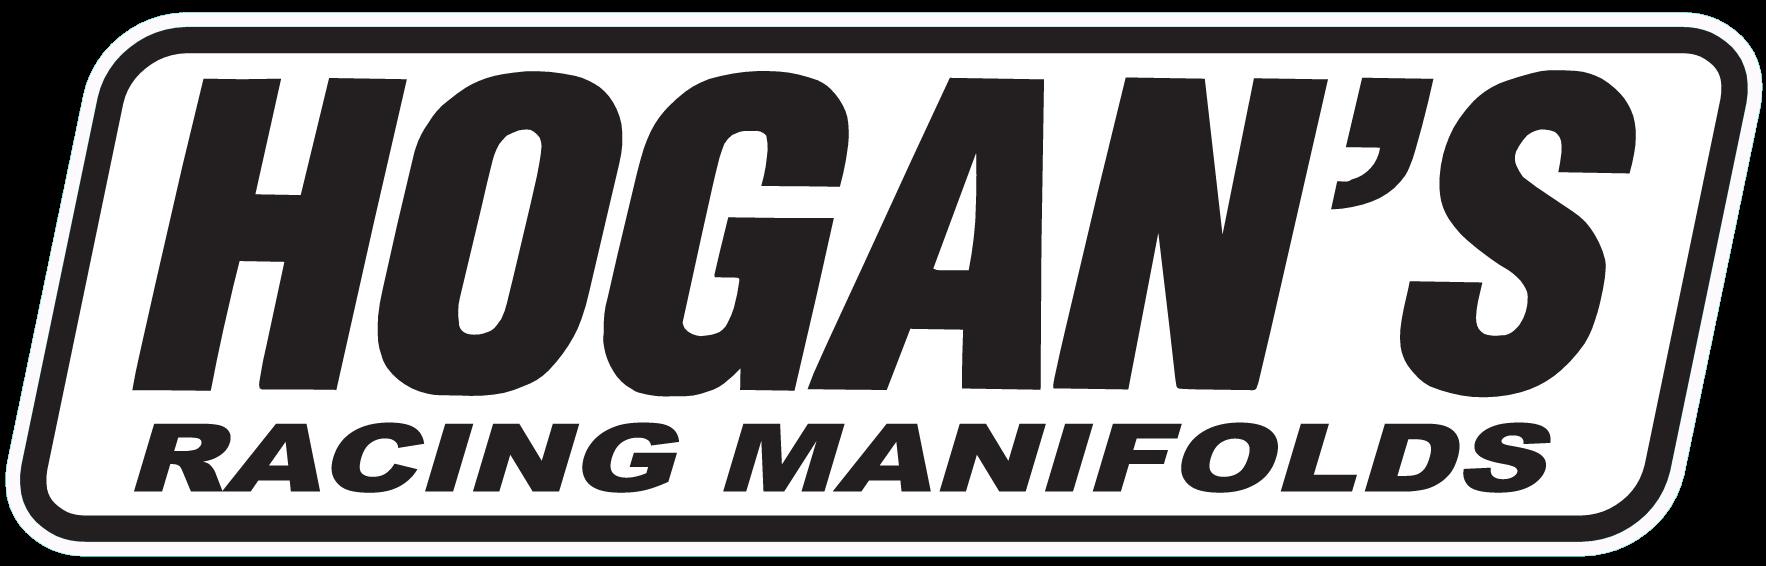 Hogan's Racing Manifolds – Custom Racing Intake Manifolds